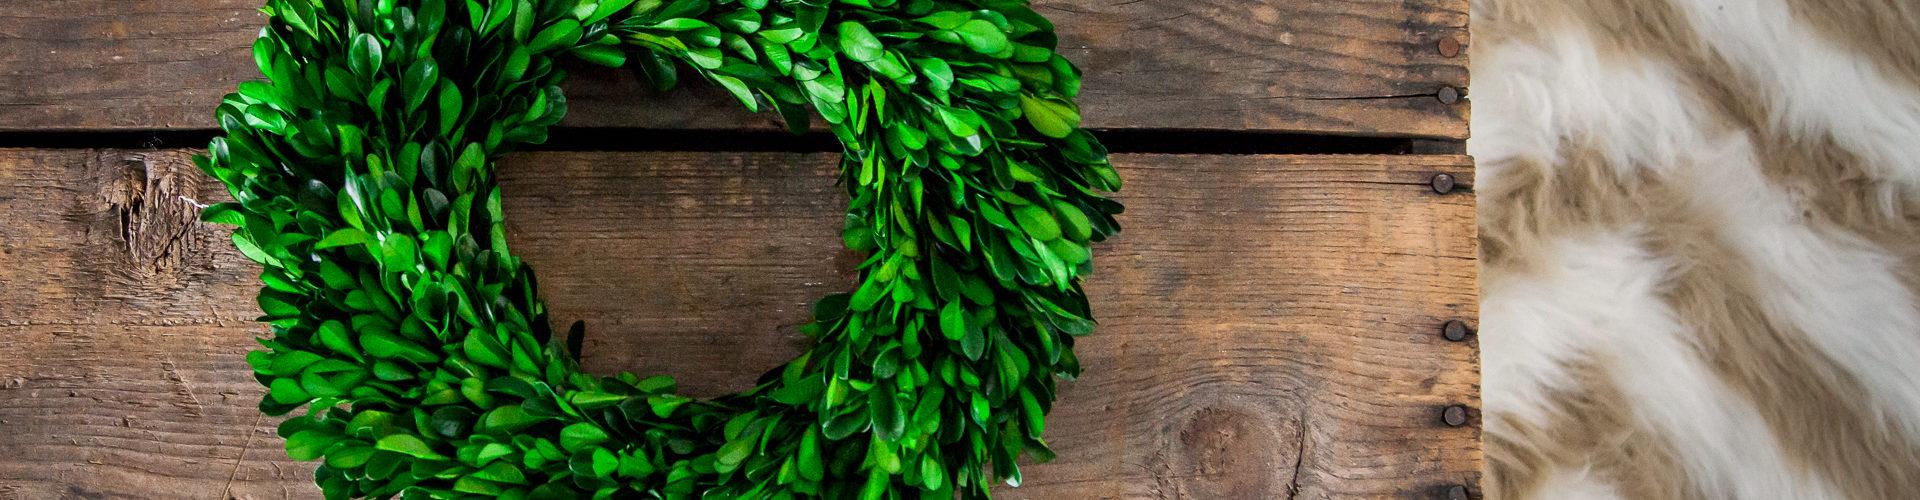 DIY Wreath Storage